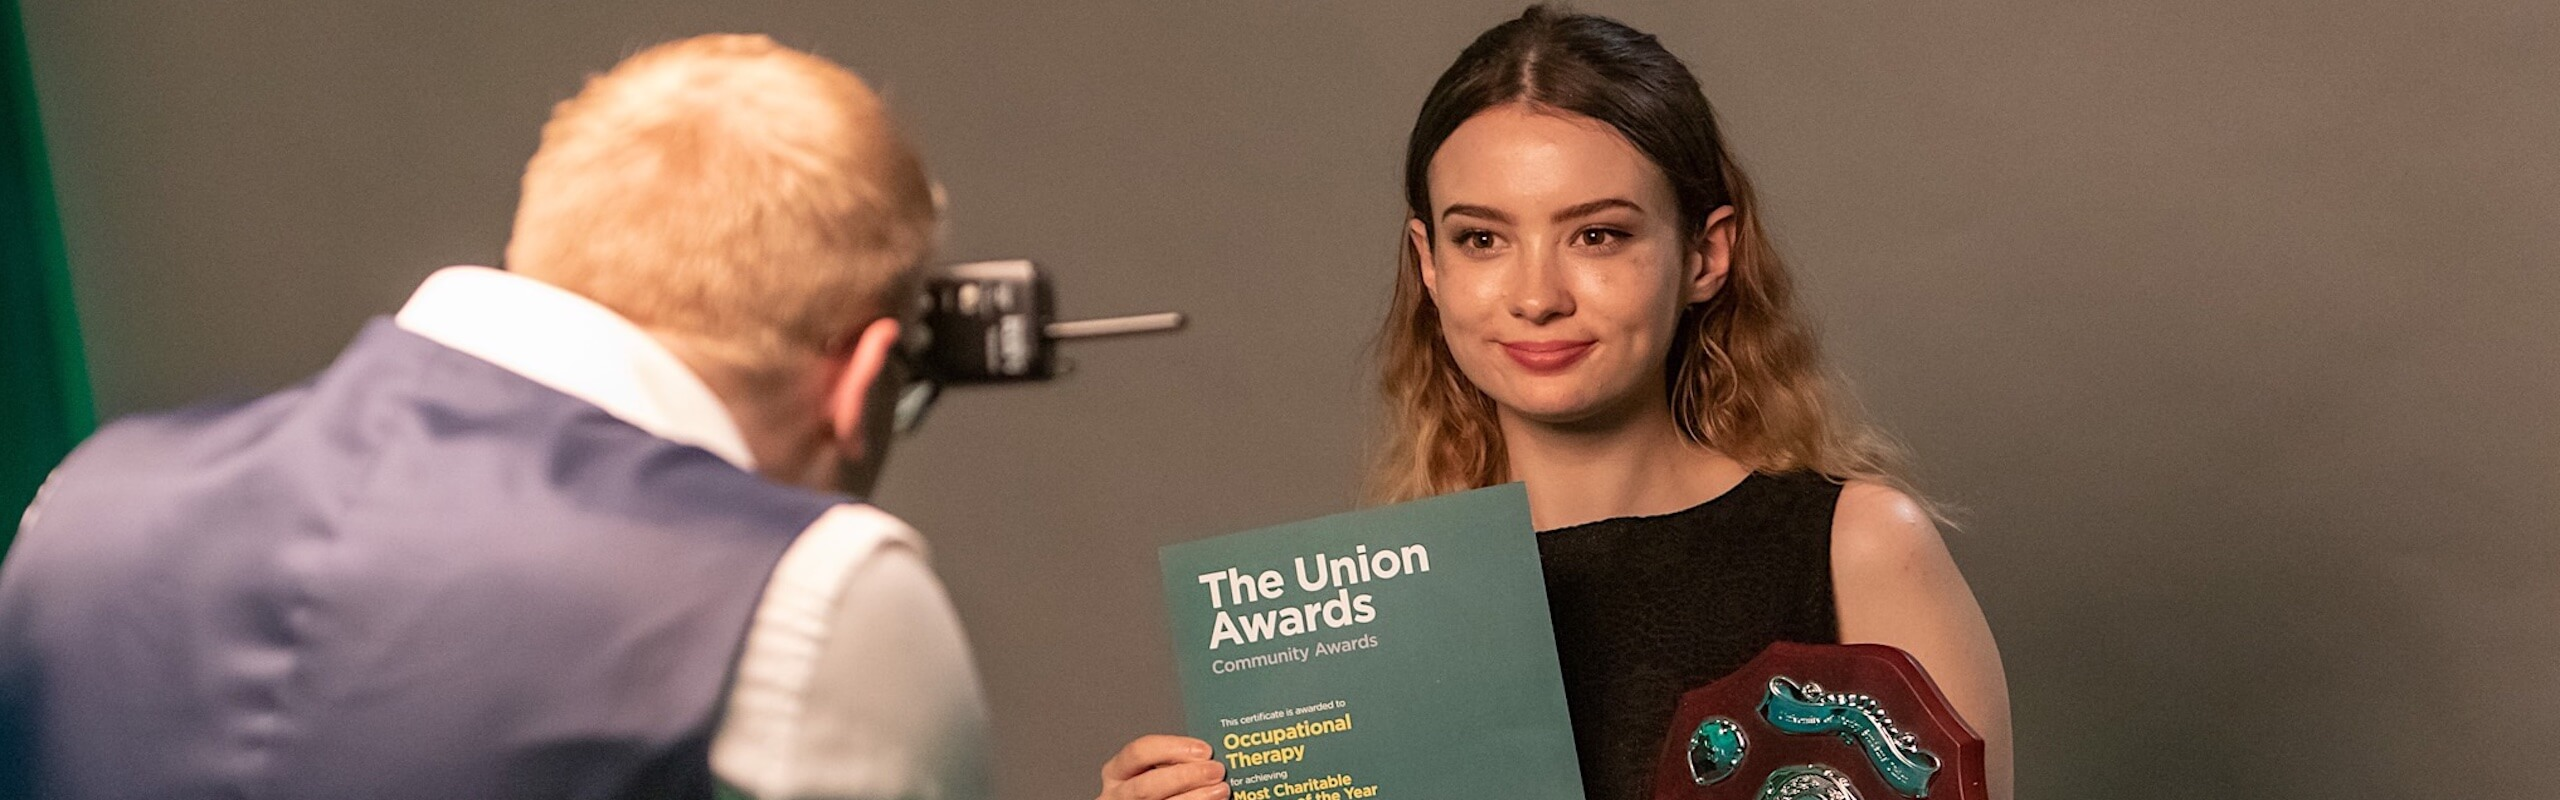 Student receiving an awards